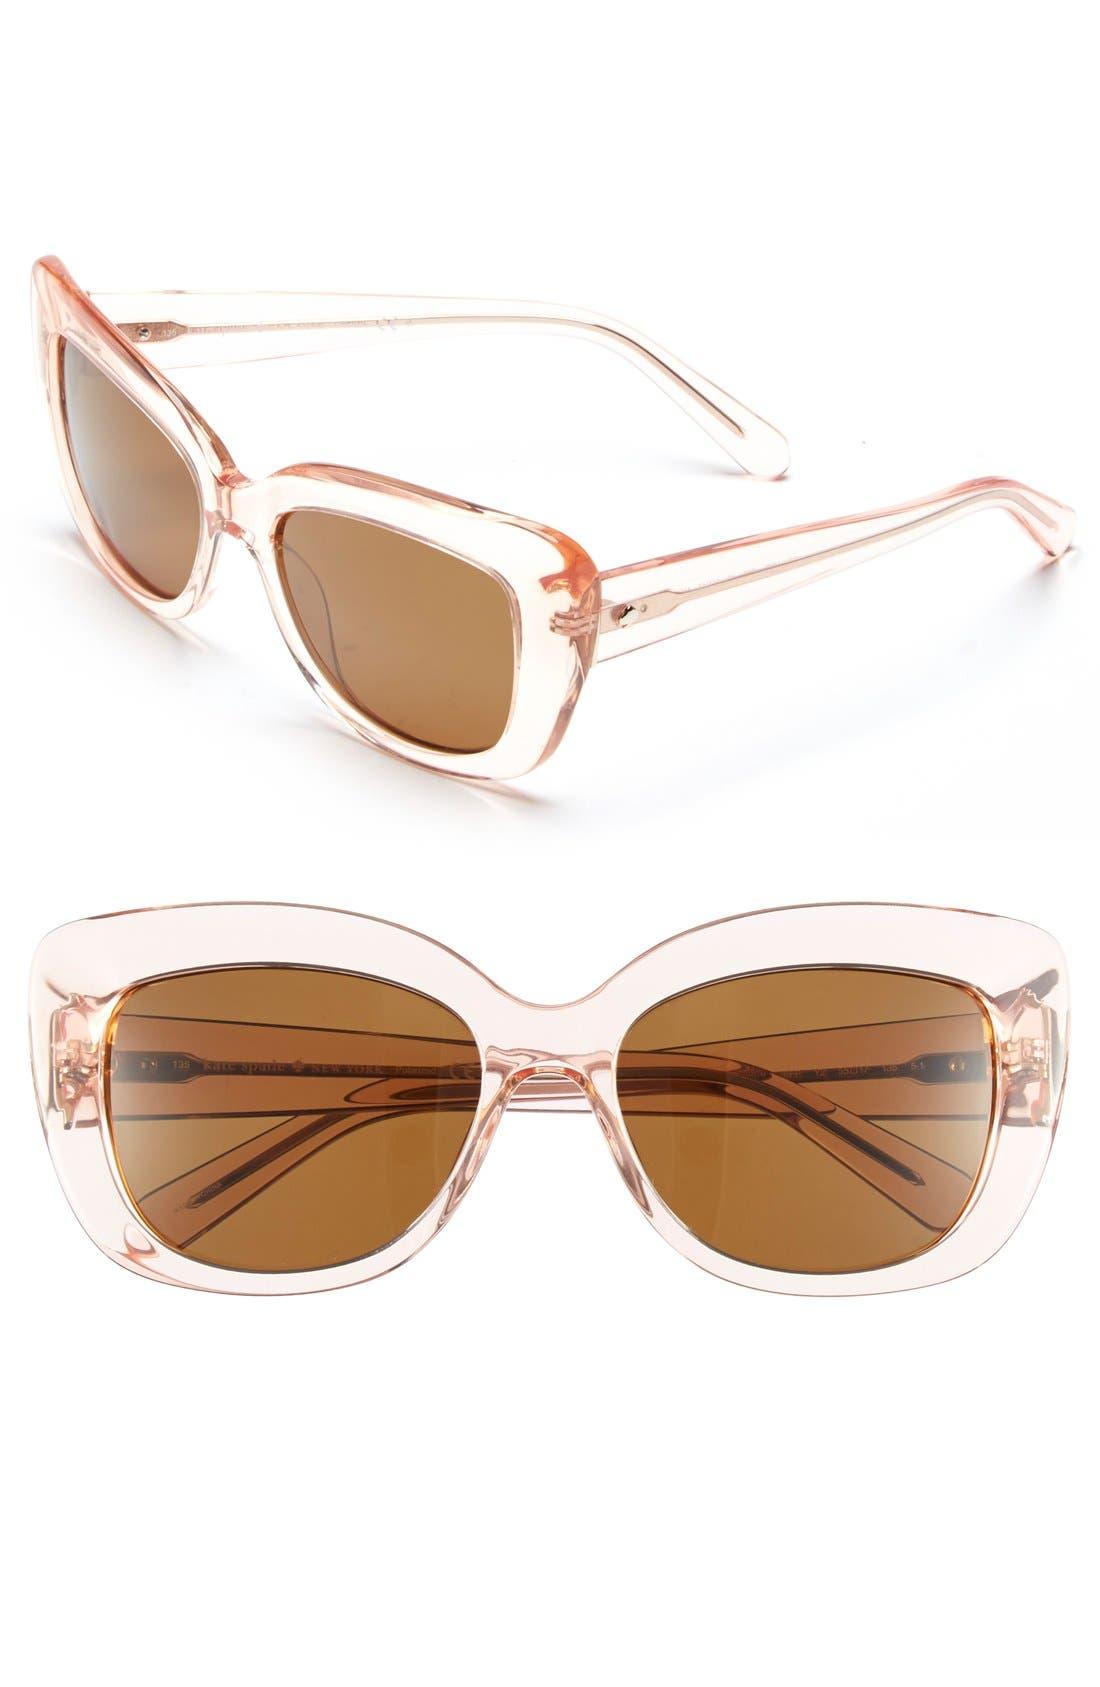 'ursula' 55mm polarized cat eye sunglasses,                             Main thumbnail 1, color,                             Neutral